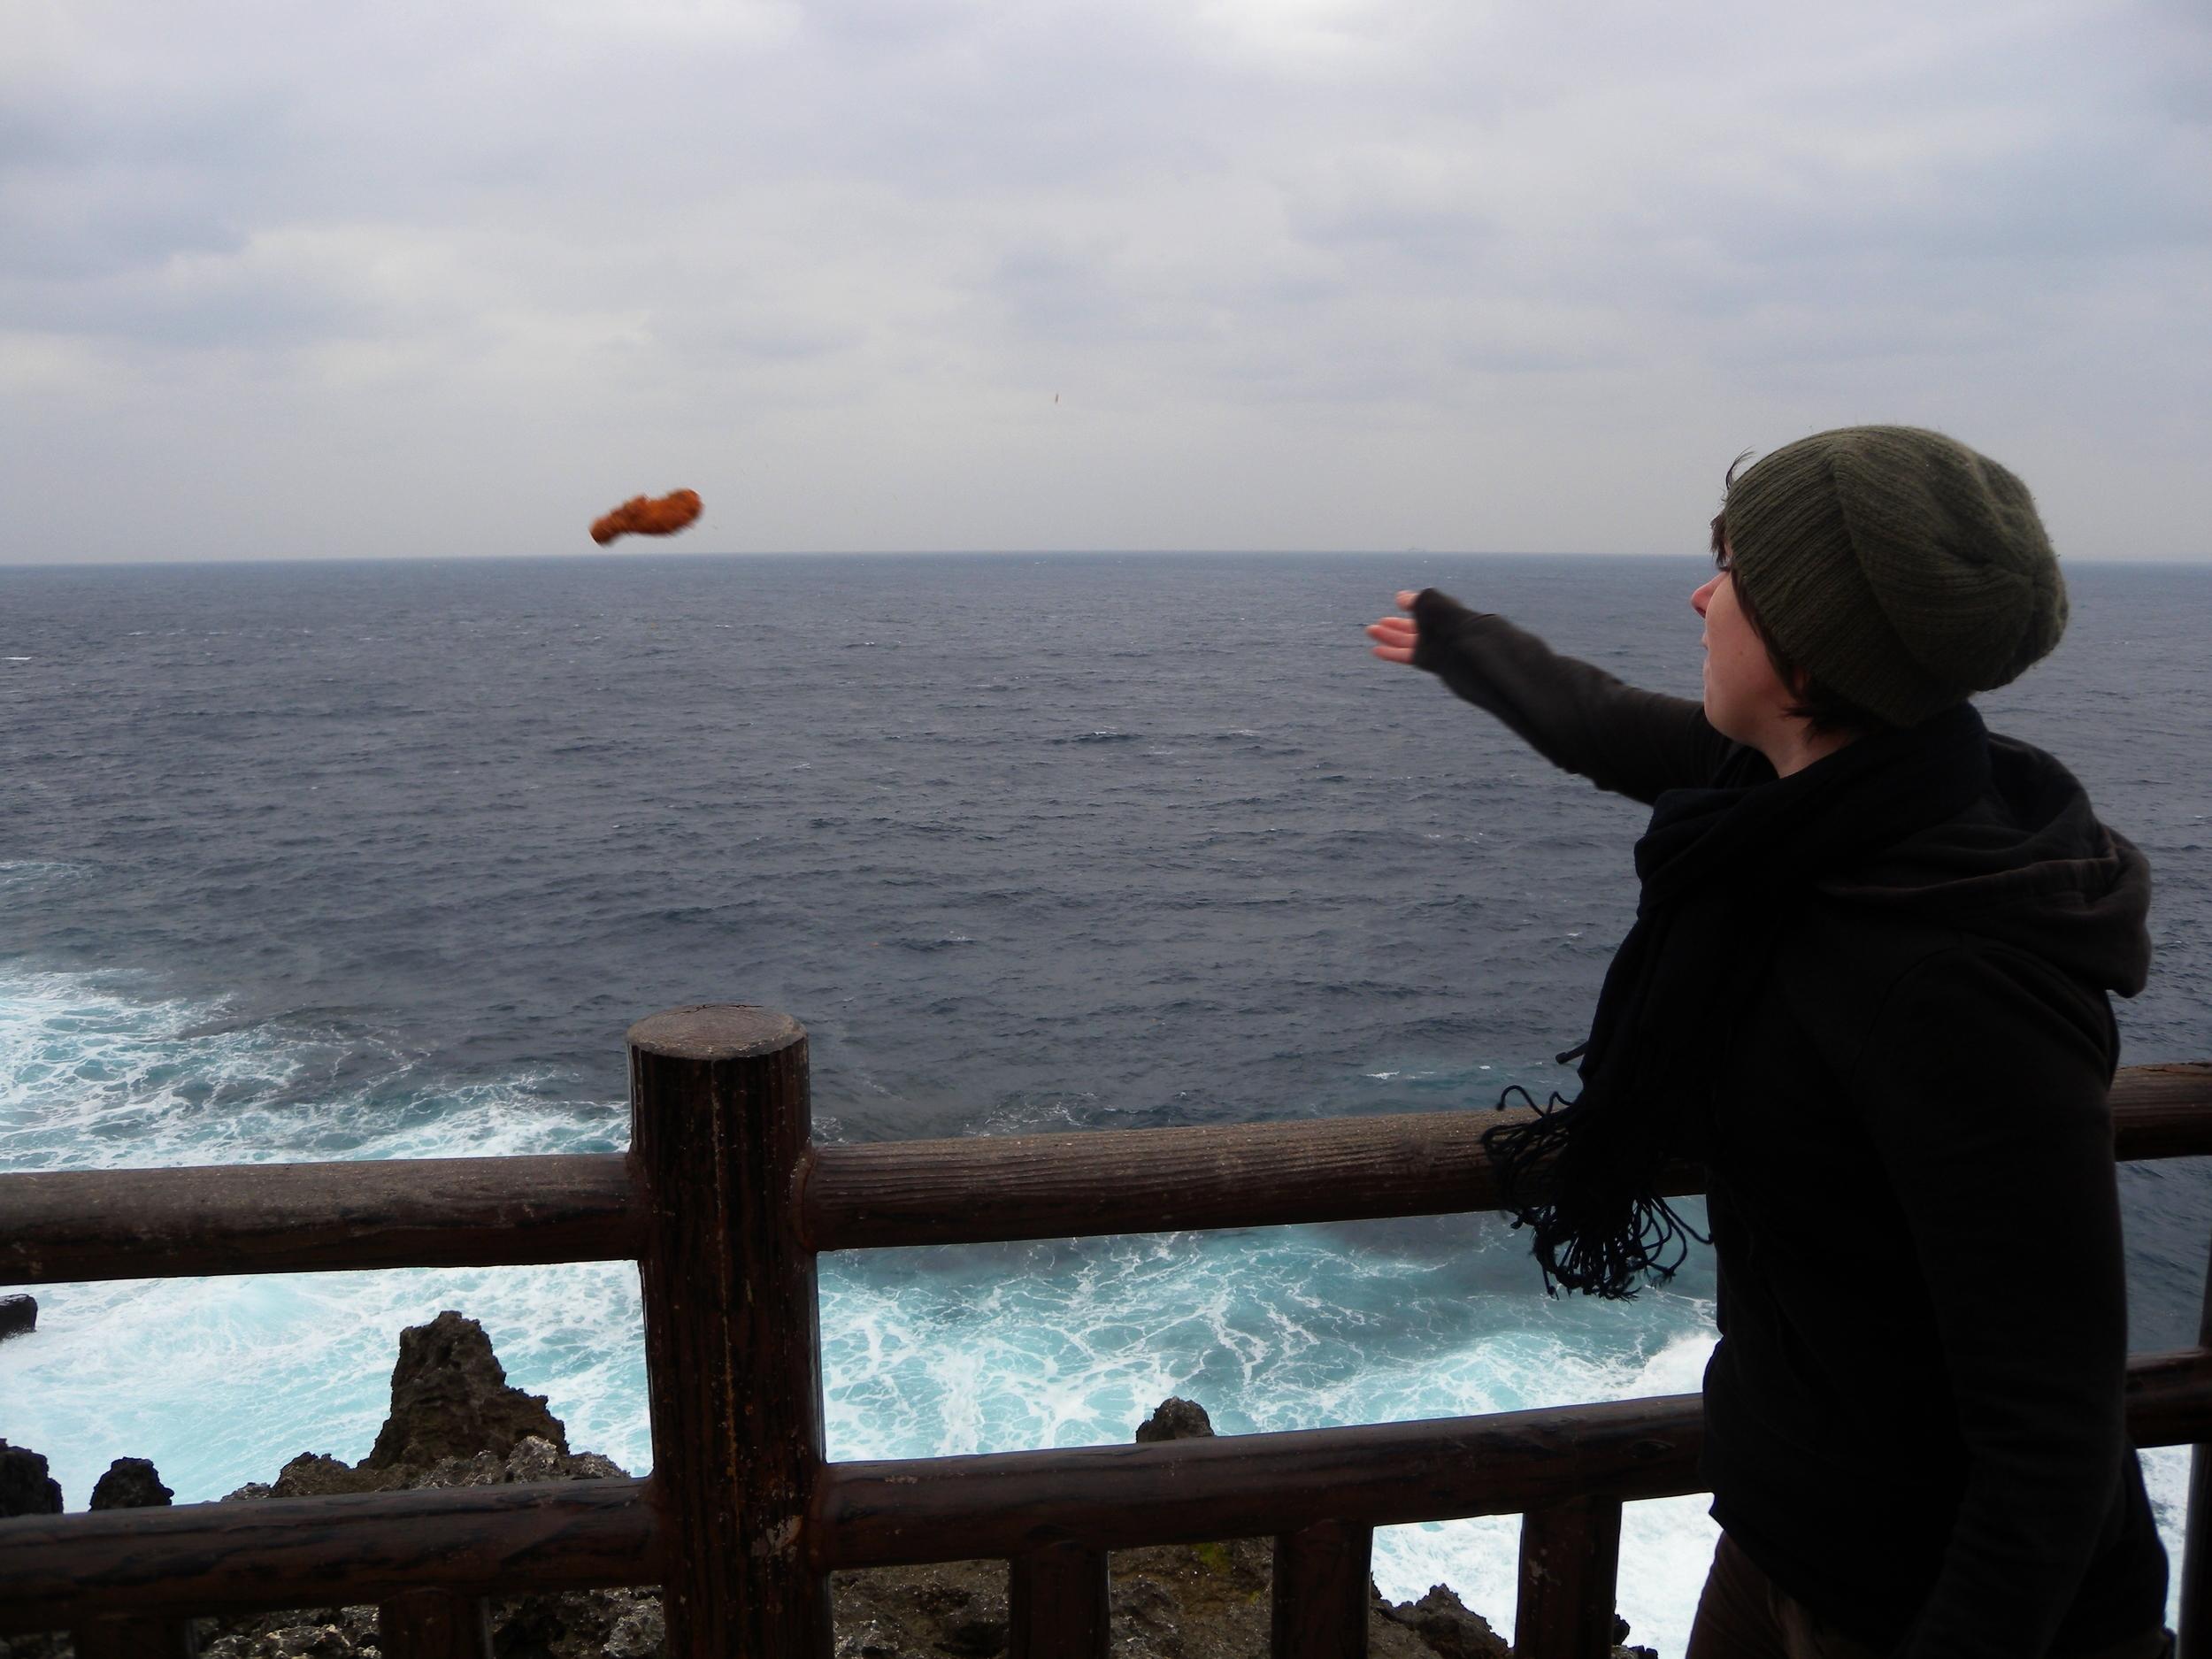 Backpacking Okinawa.